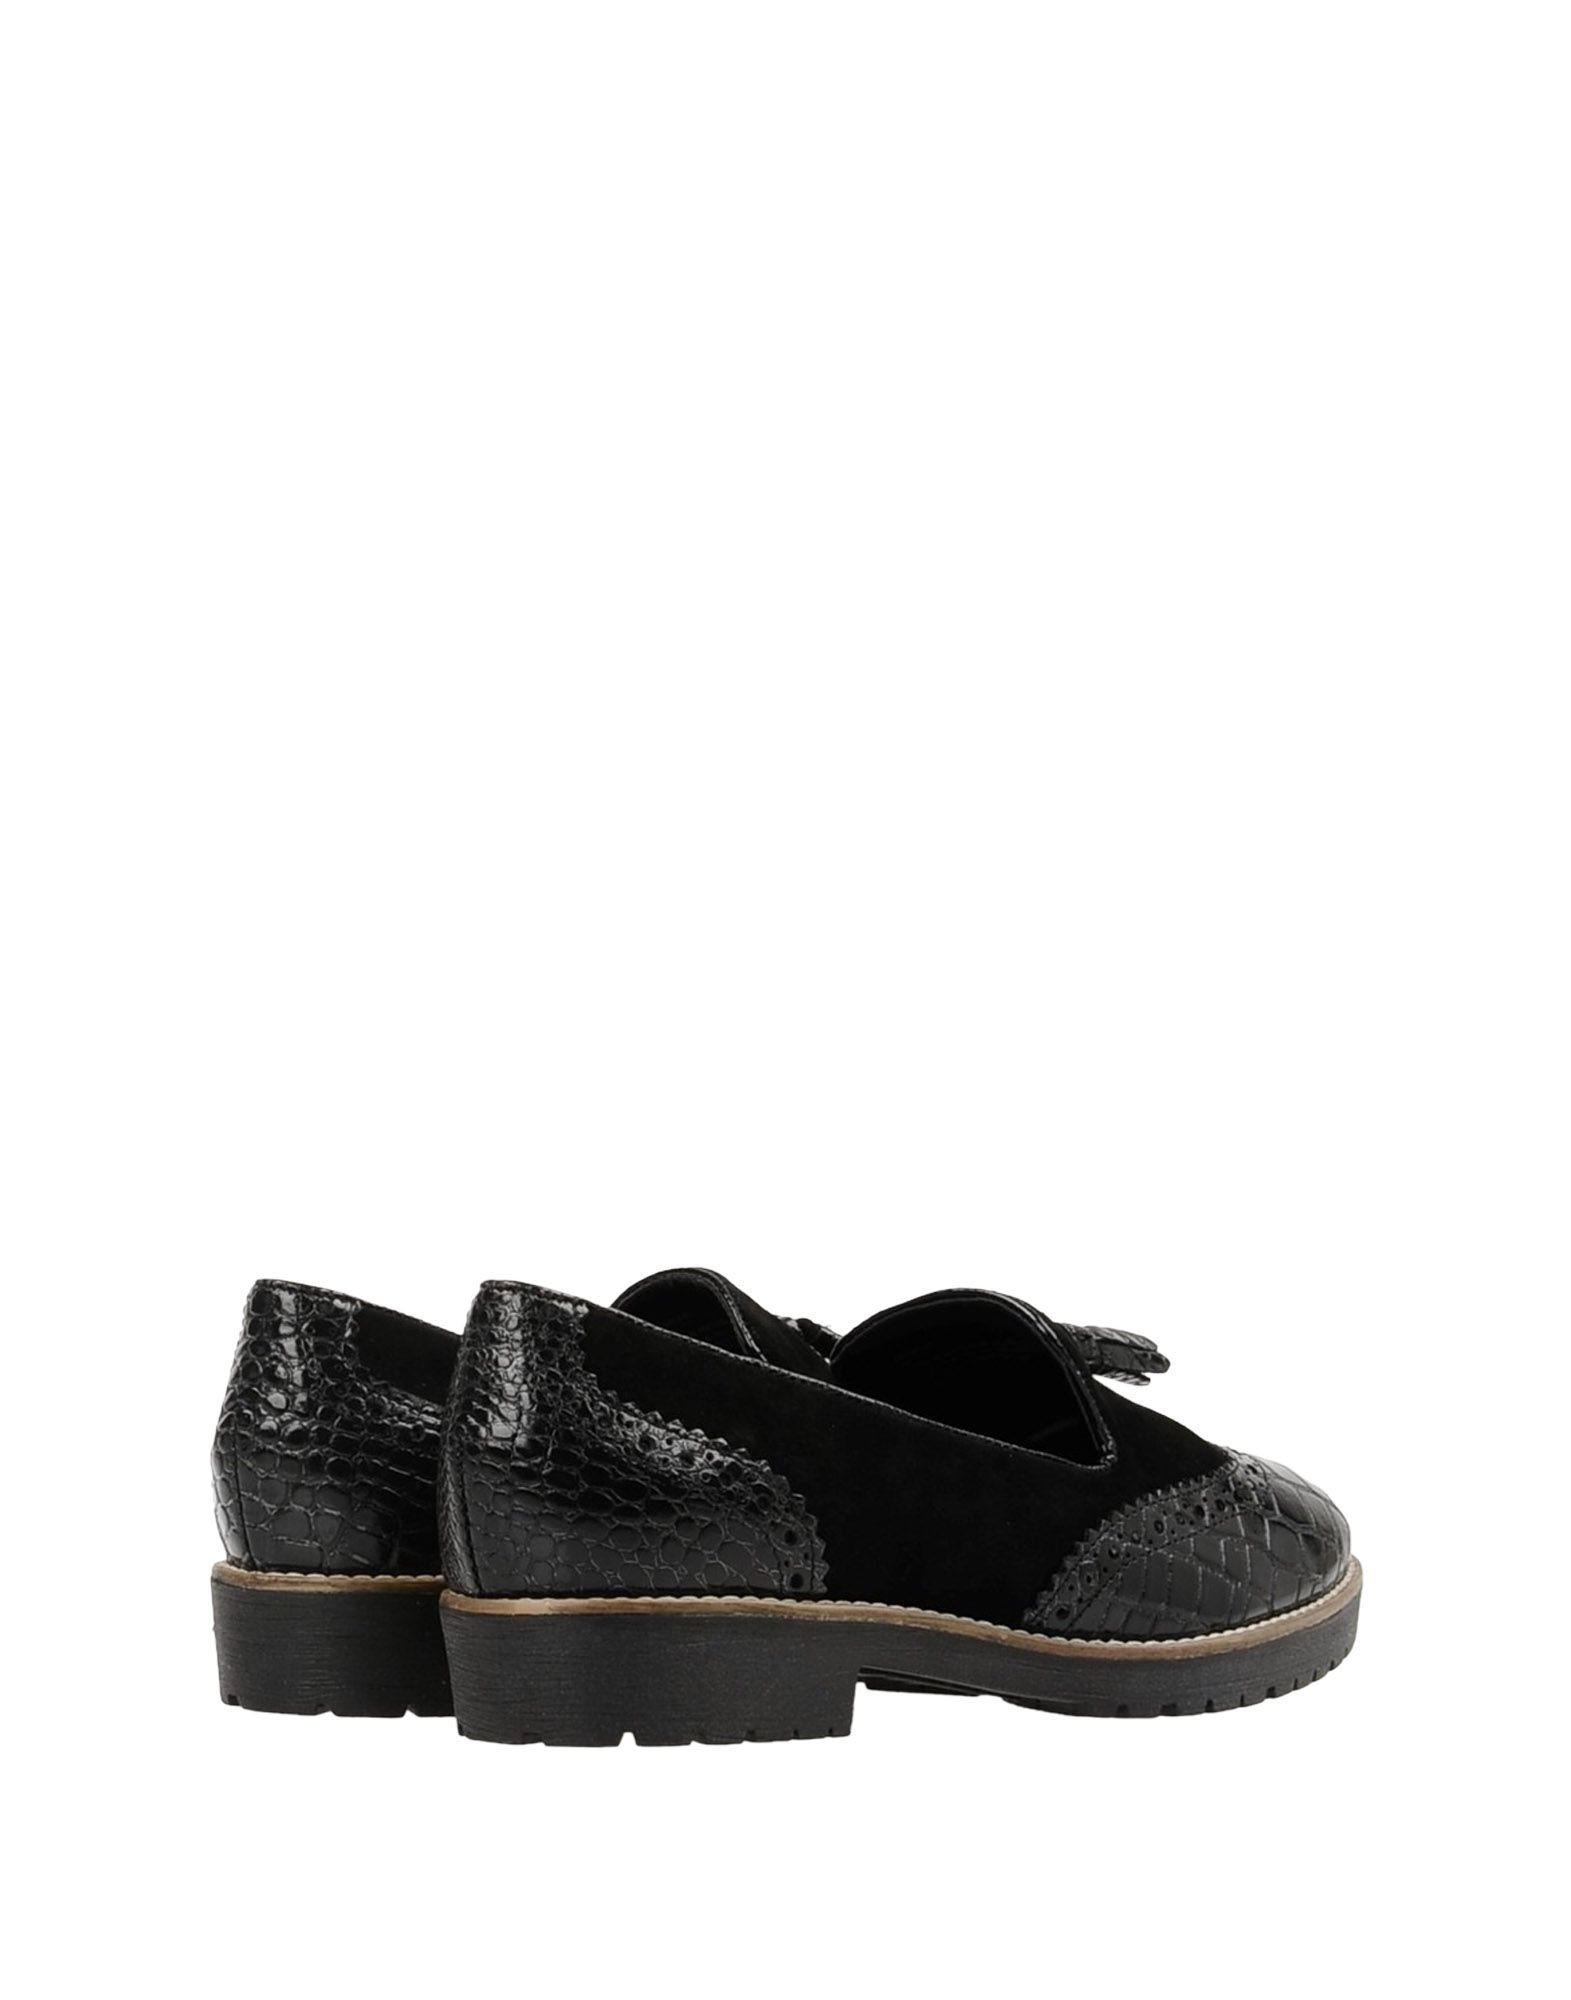 Dune London Qualität Giorgia  11375389OD Gute Qualität London beliebte Schuhe fa82e8